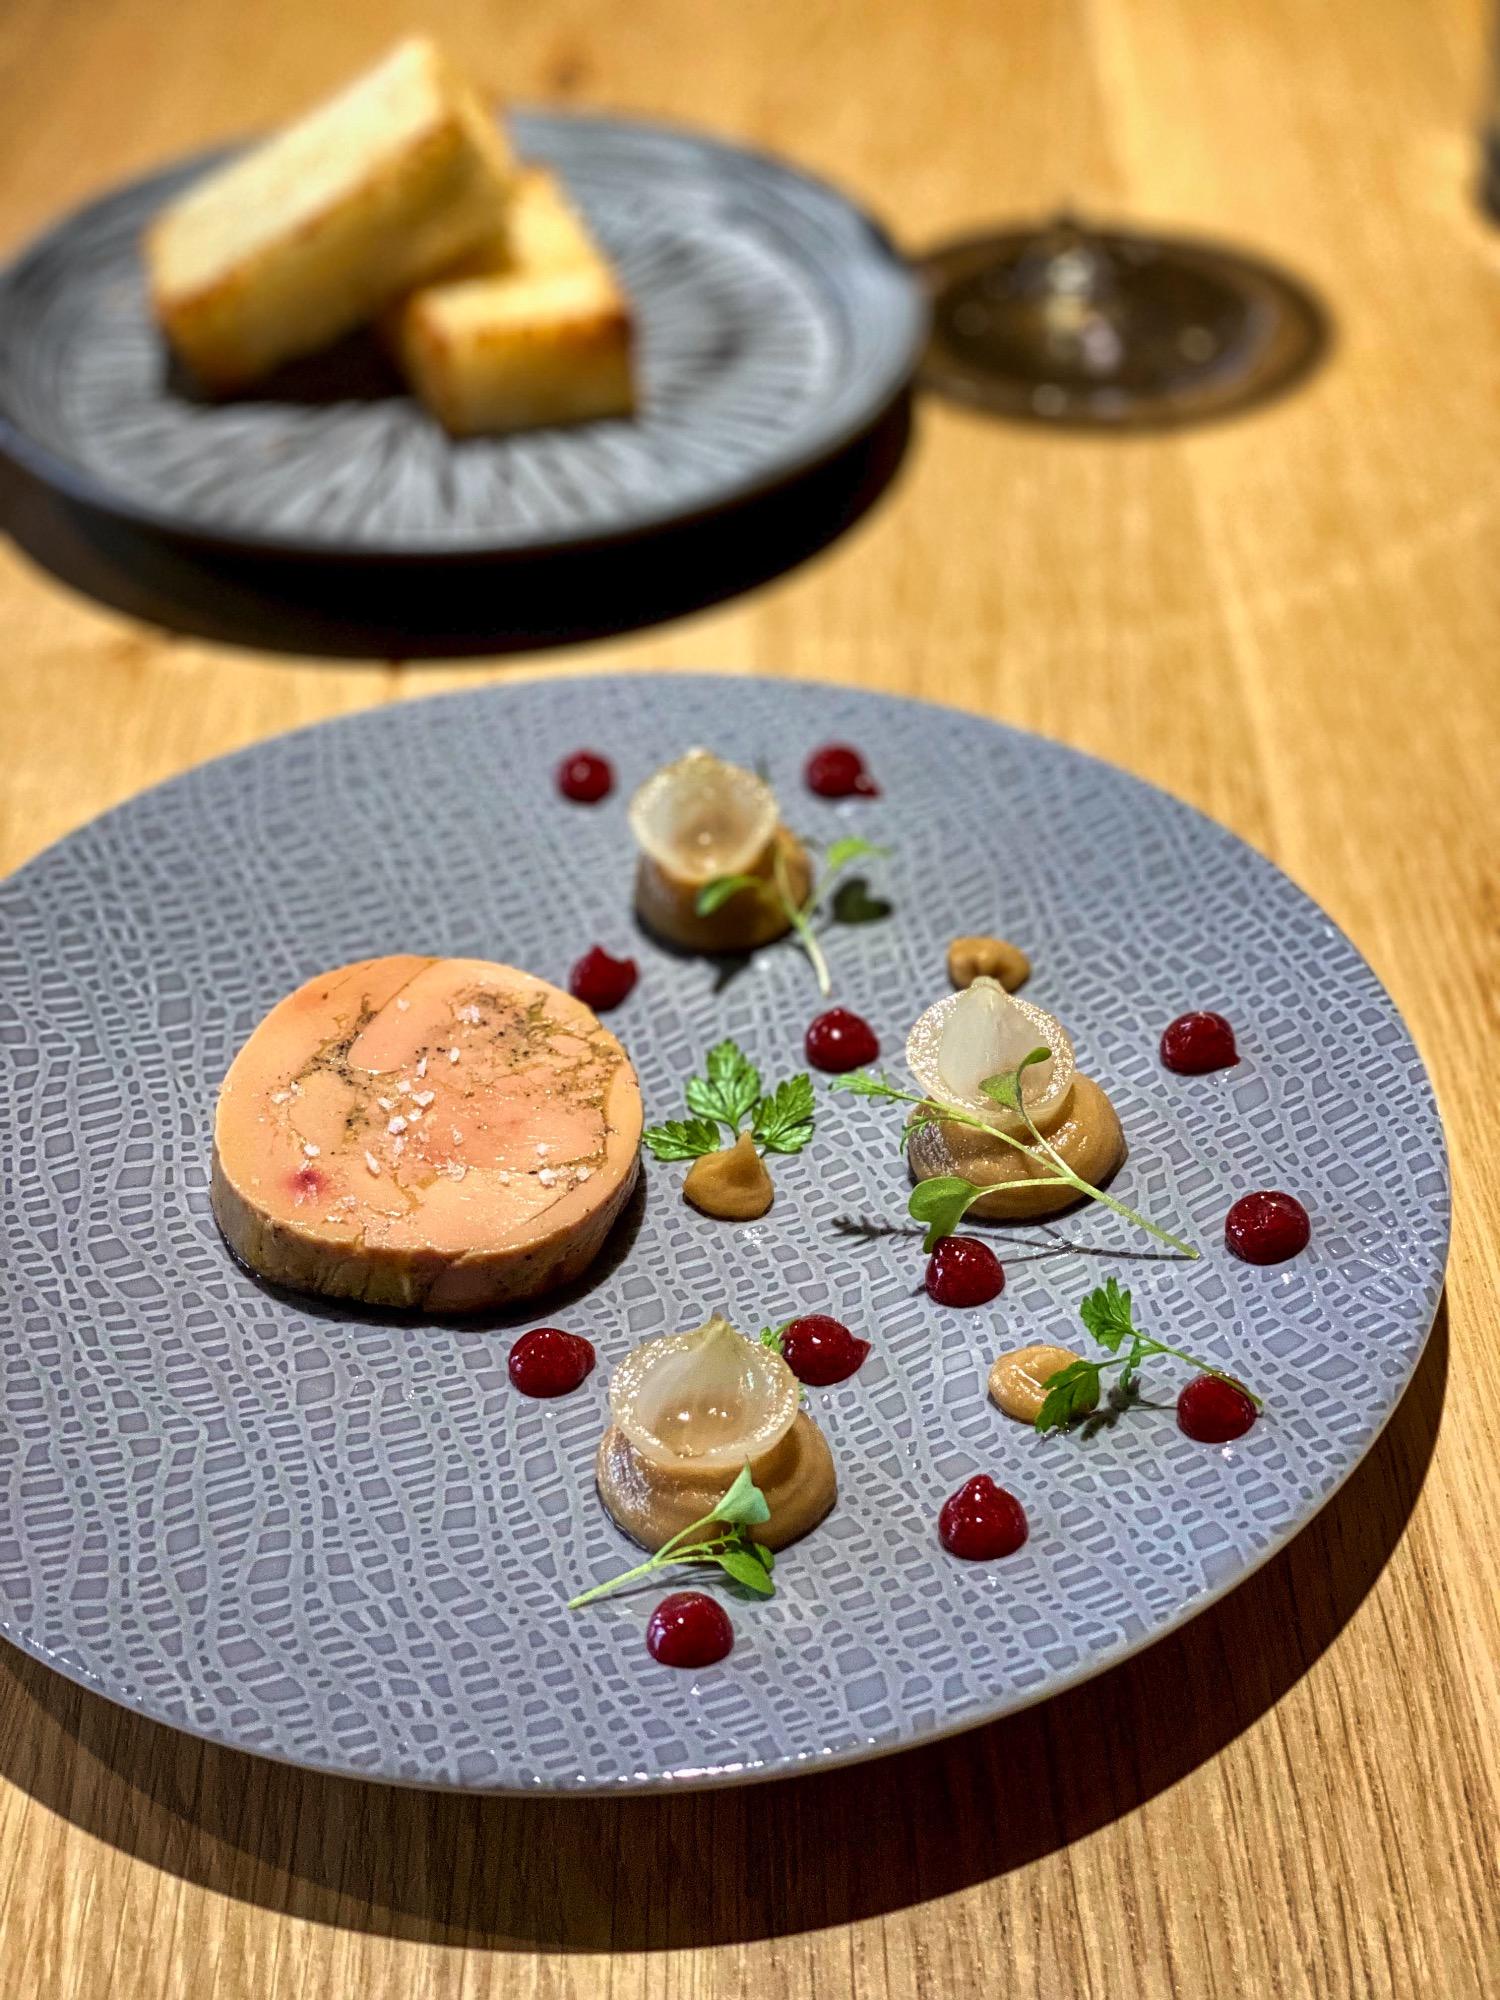 img_5984_essencia_tiago_michelin_budapest_restaurant_jokuti_vilagevo.jpeg